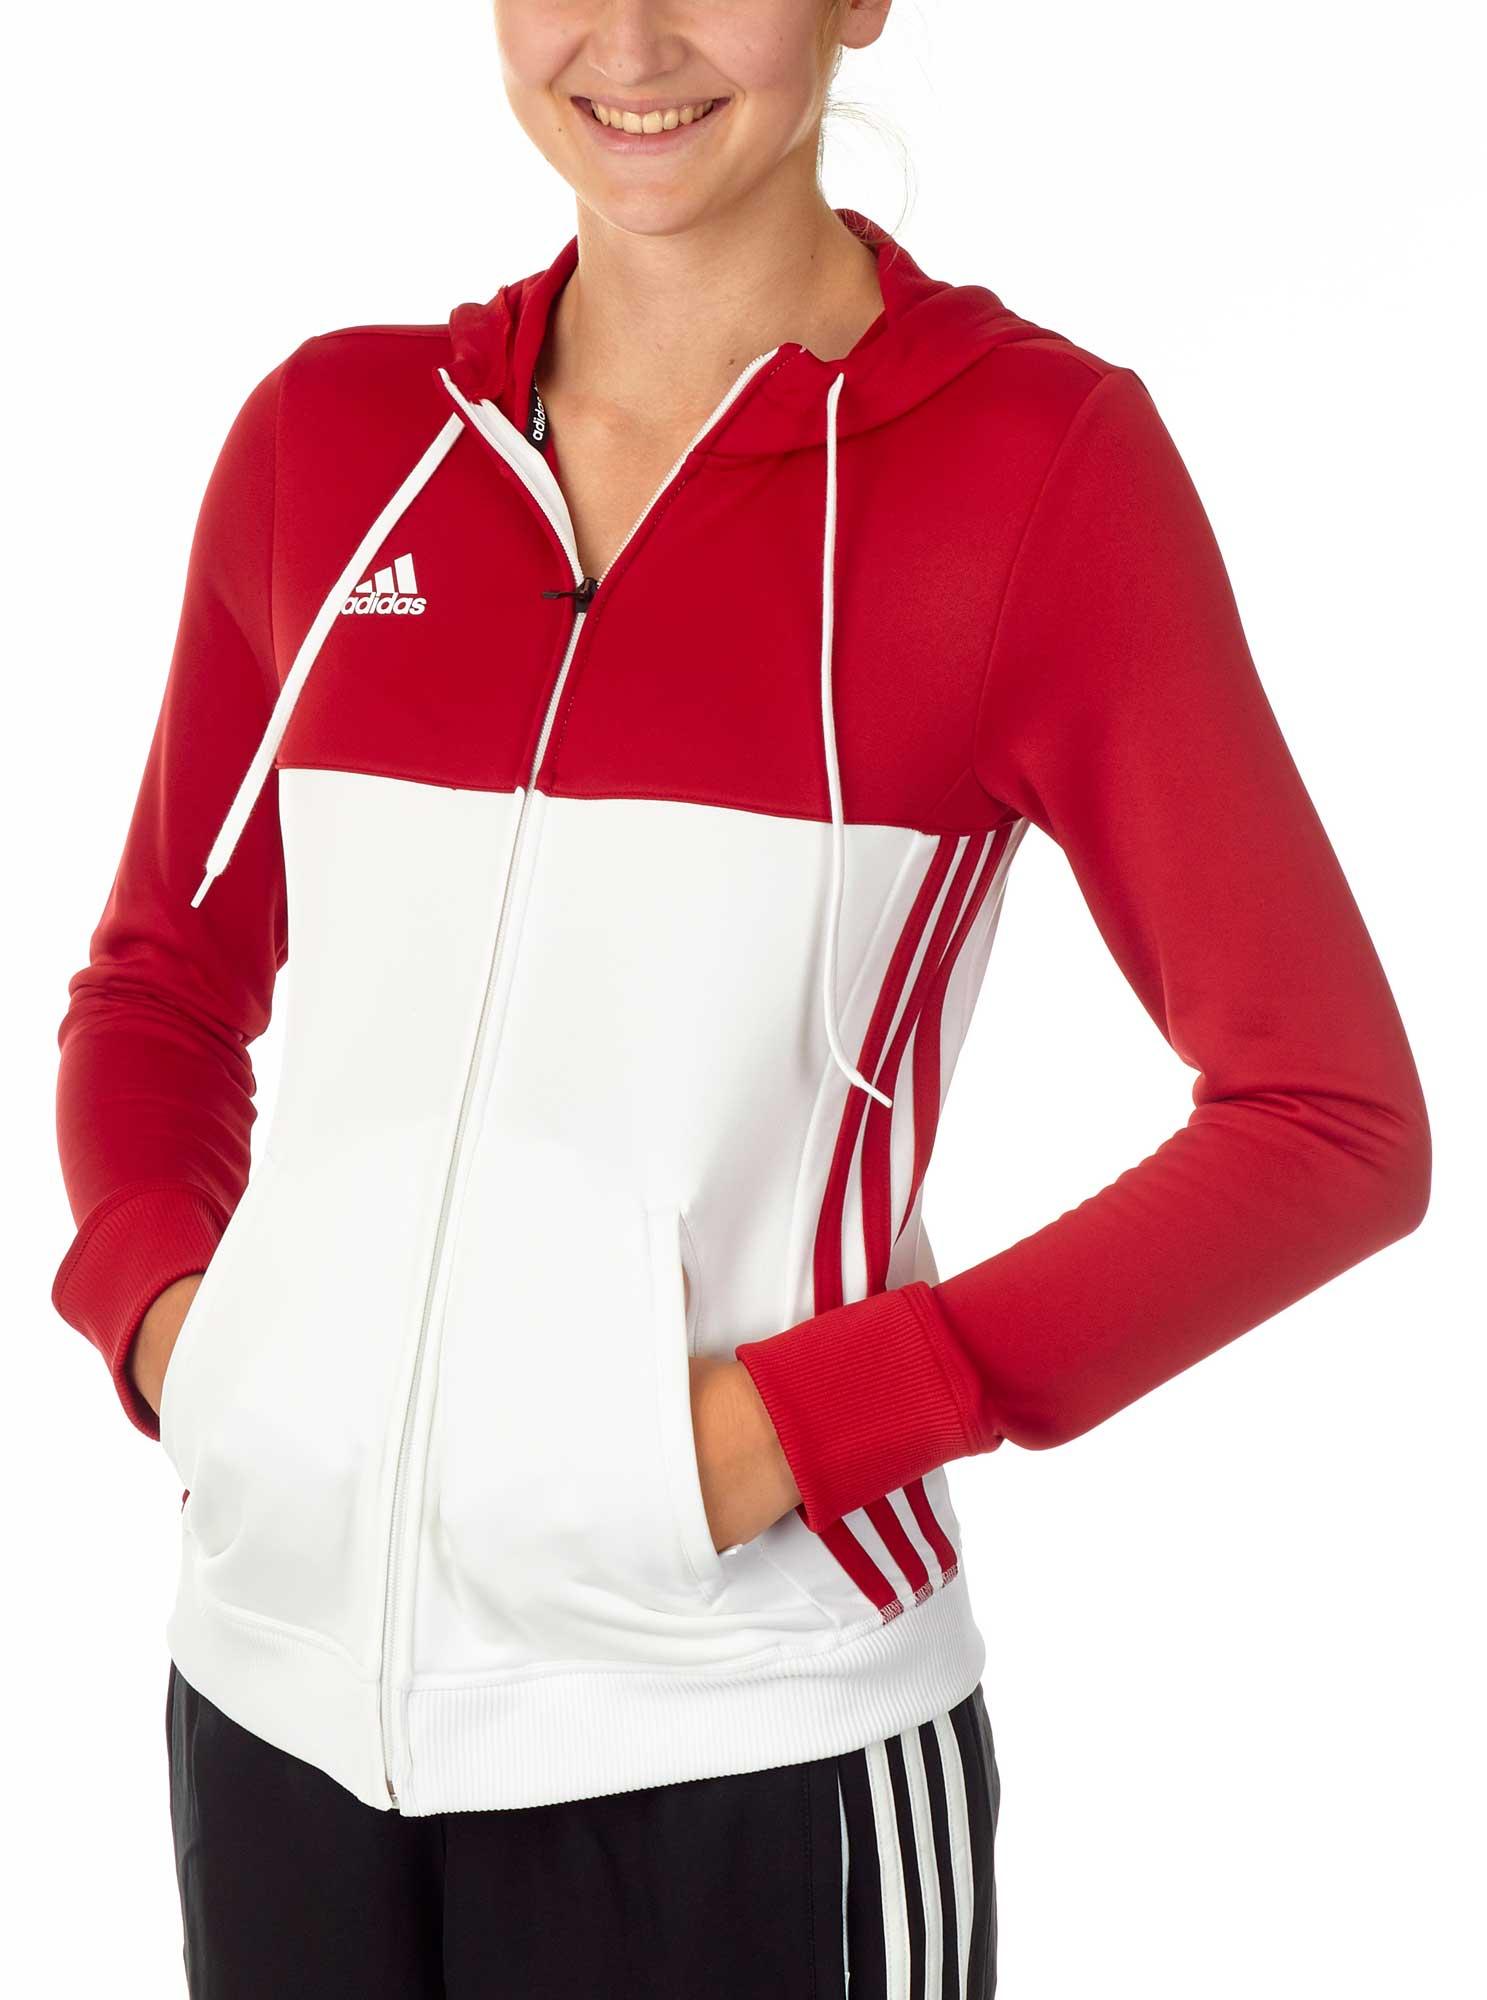 Hattinger Kampfsport Shop - adidas T16 Team Hoodie Damen power rot ... 3cdb0e63b3